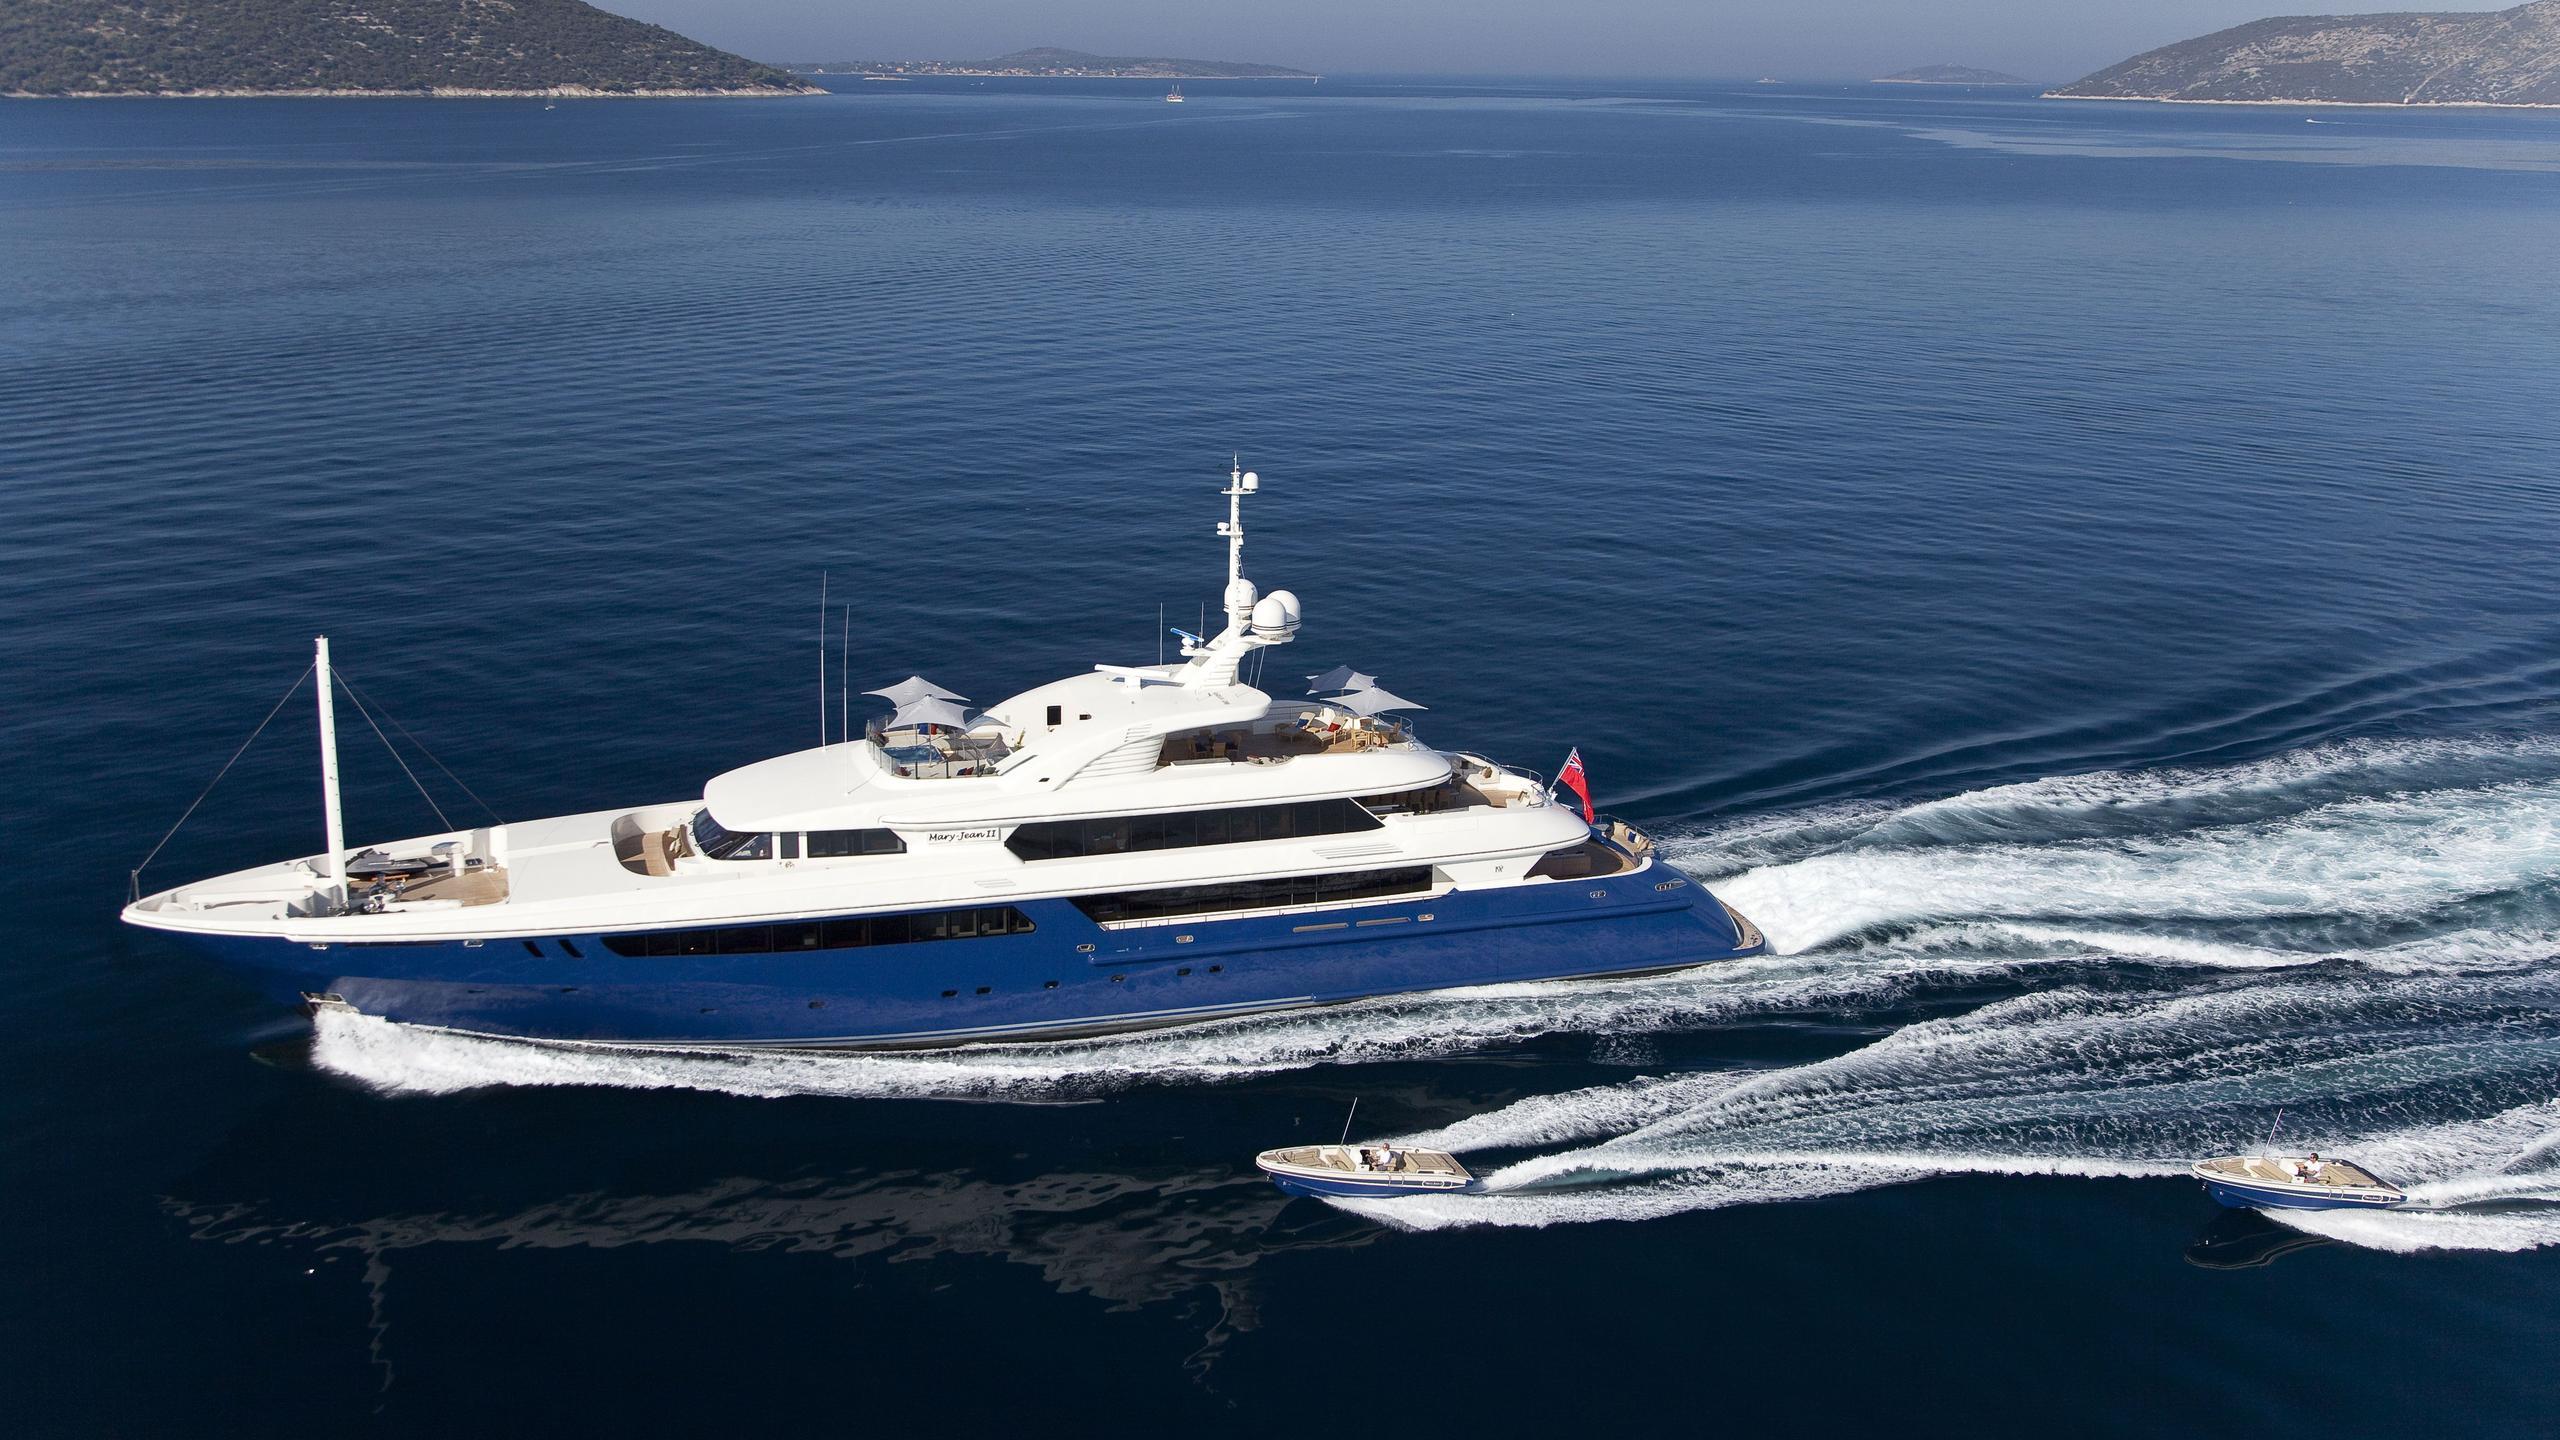 Mary Jean II yacht running